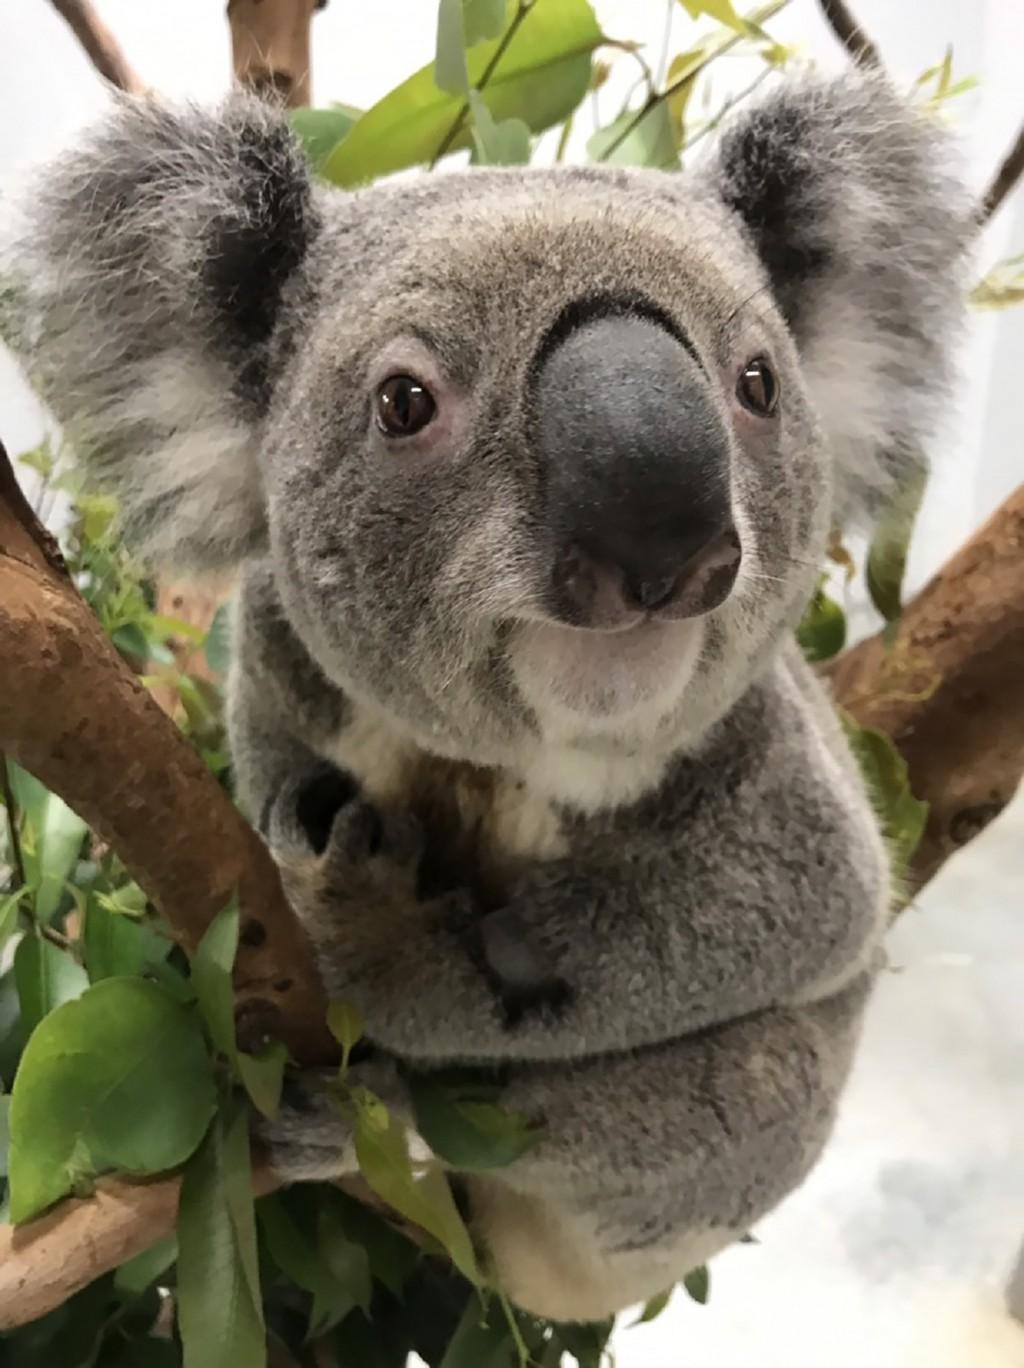 Taipei Zoo's newest koala, Wolverine.